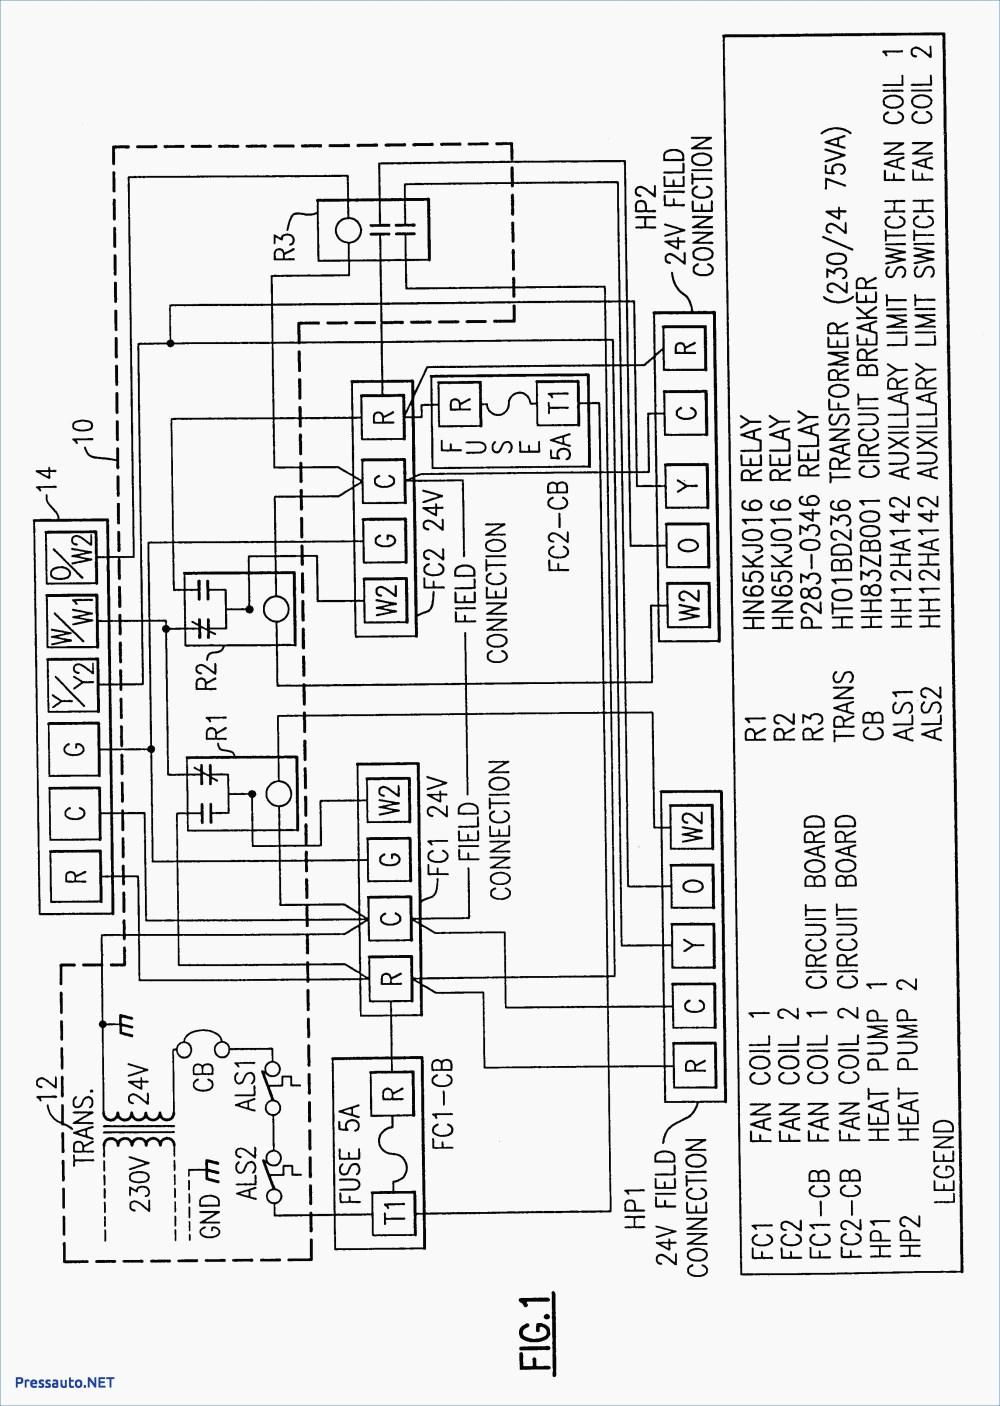 medium resolution of fujitsu mini split heat pump wiring diagram air source heat pump wiring diagram wellread me